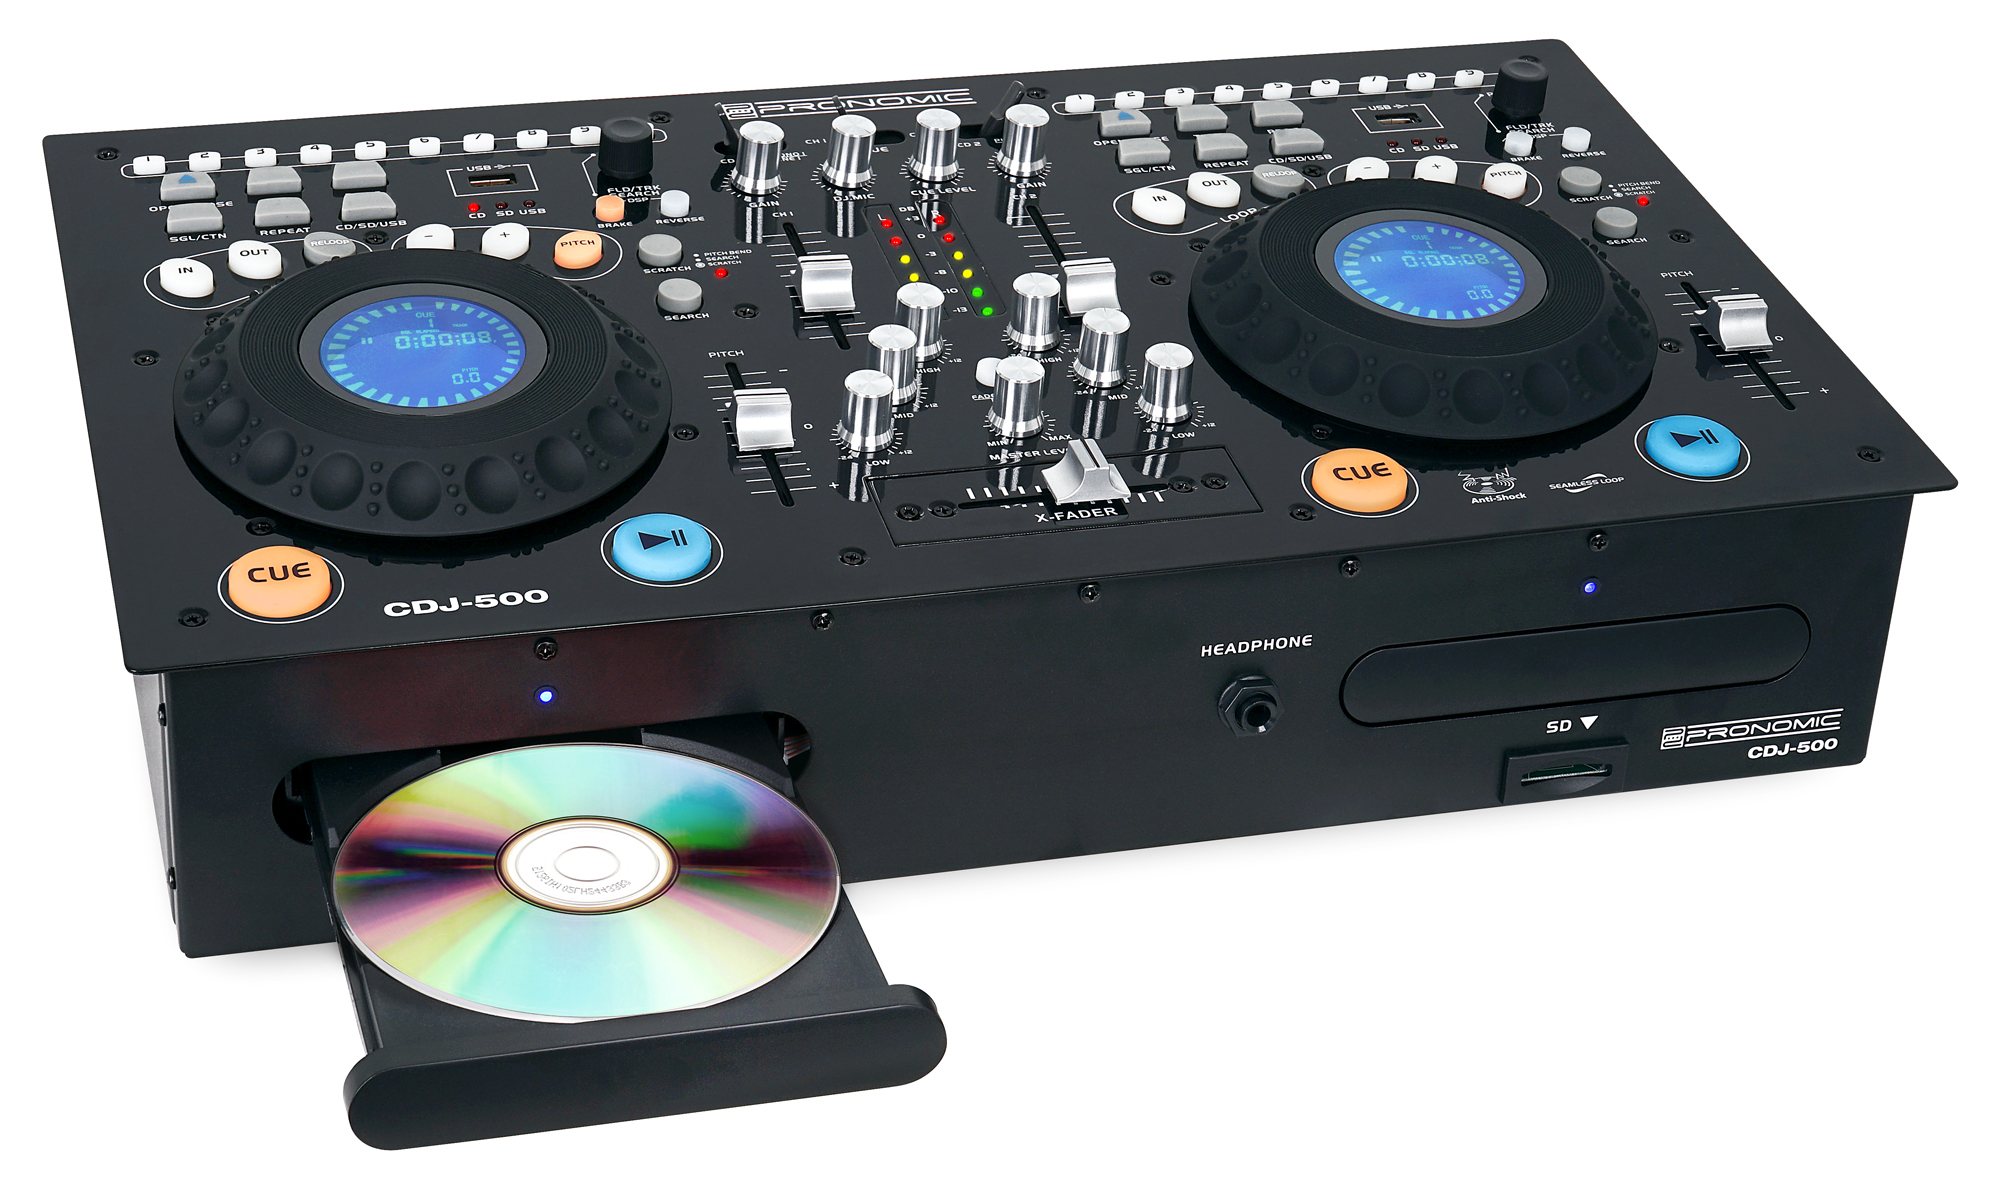 Cdplayer - Pronomic CDJ 500 Full Station Doppel DJ CD Player - Onlineshop Musikhaus Kirstein